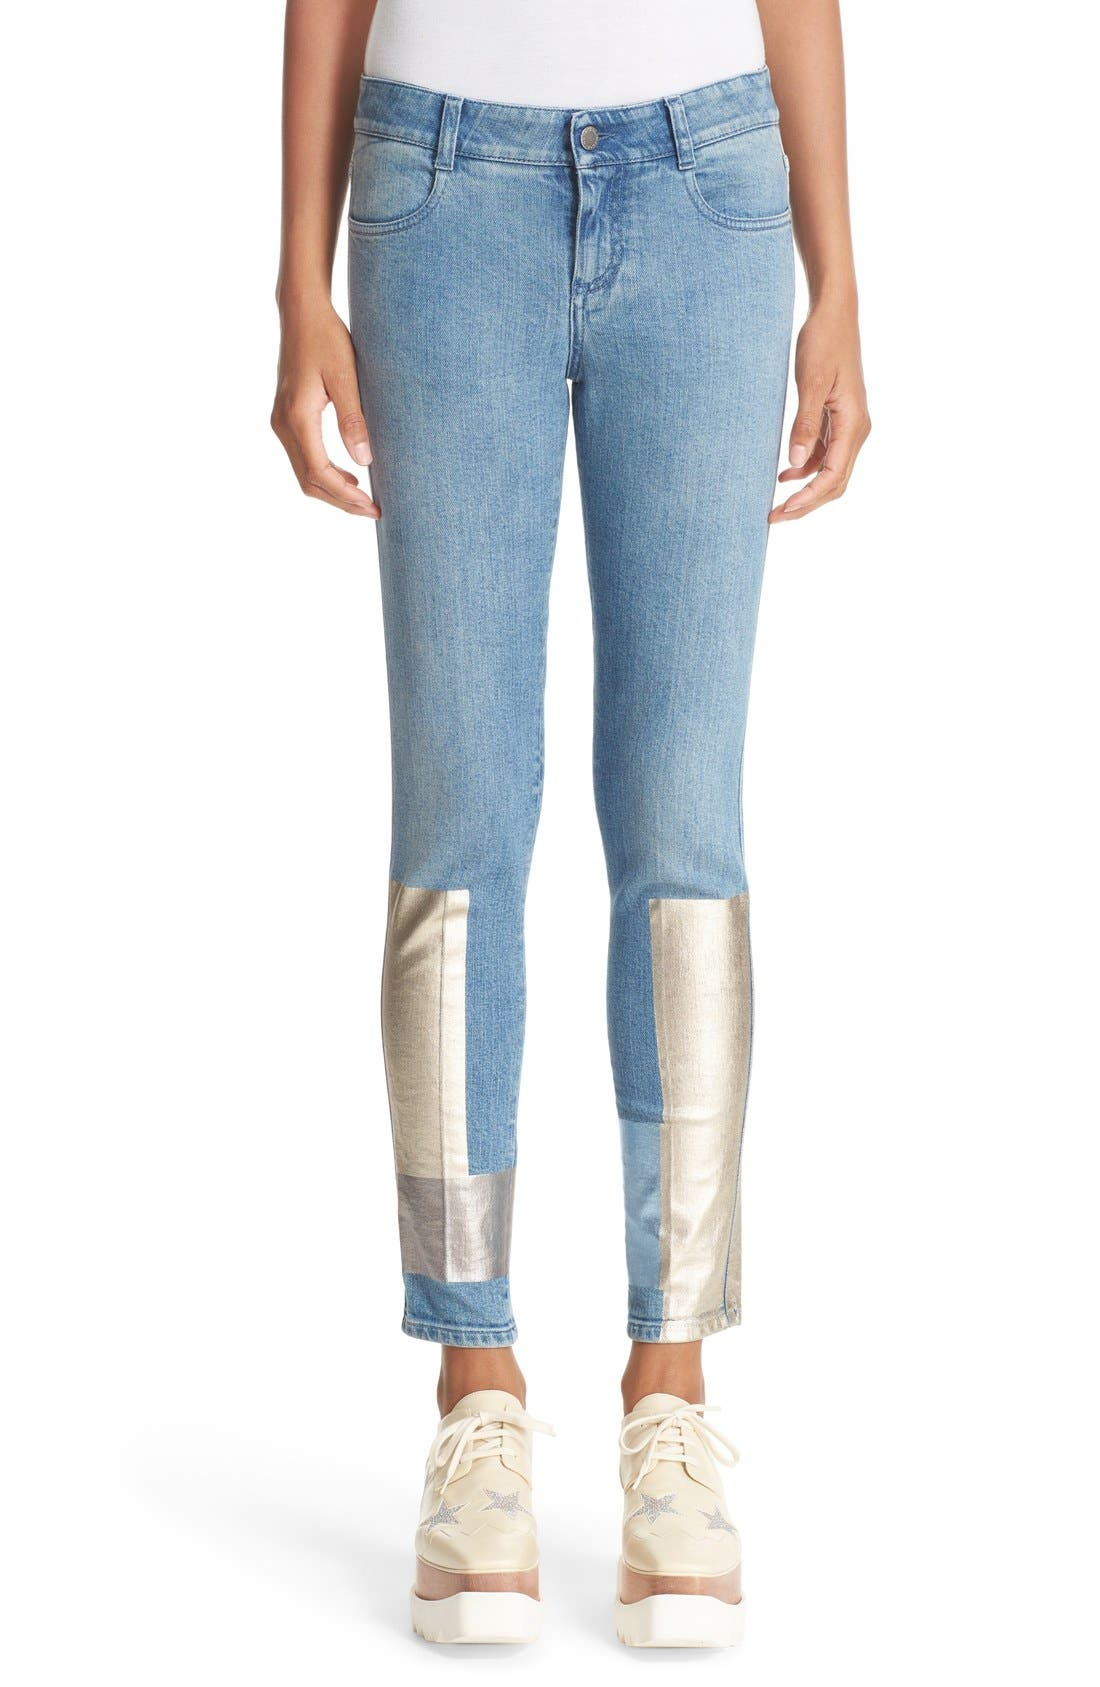 Alternate Image 1 Selected - Stella McCartney Ankle Grazer Skinny Jeans